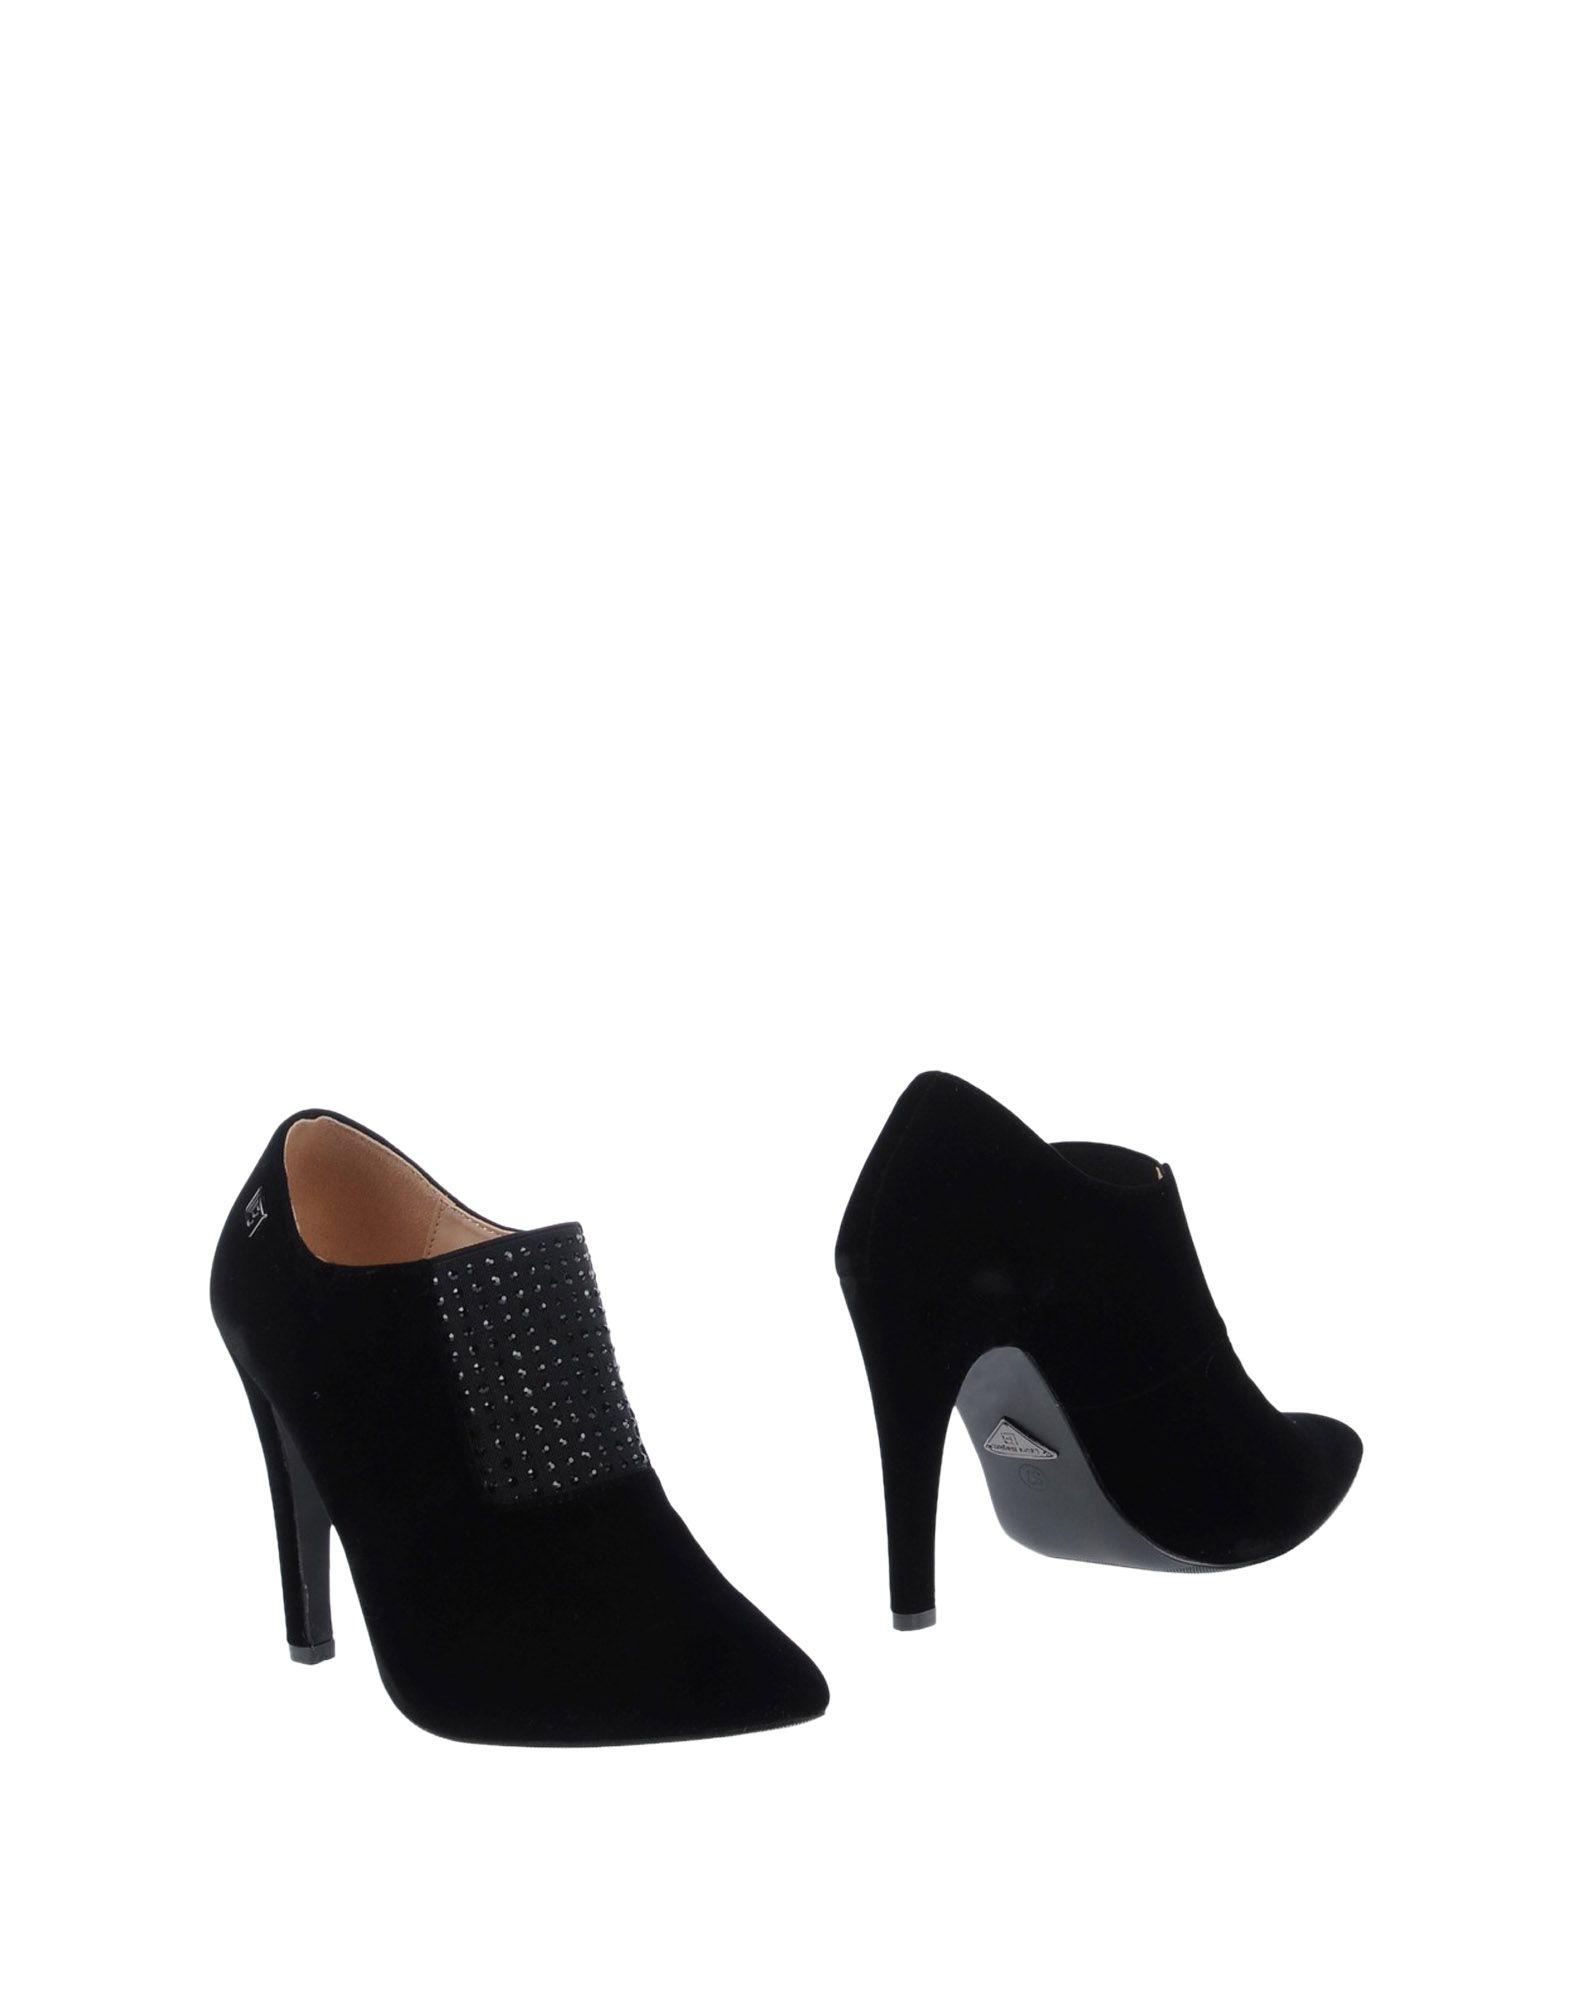 LAURA BIAGIOTTI Ботинки ботинки для девочки tiflani цвет черный 25f 801s 233 размер 31